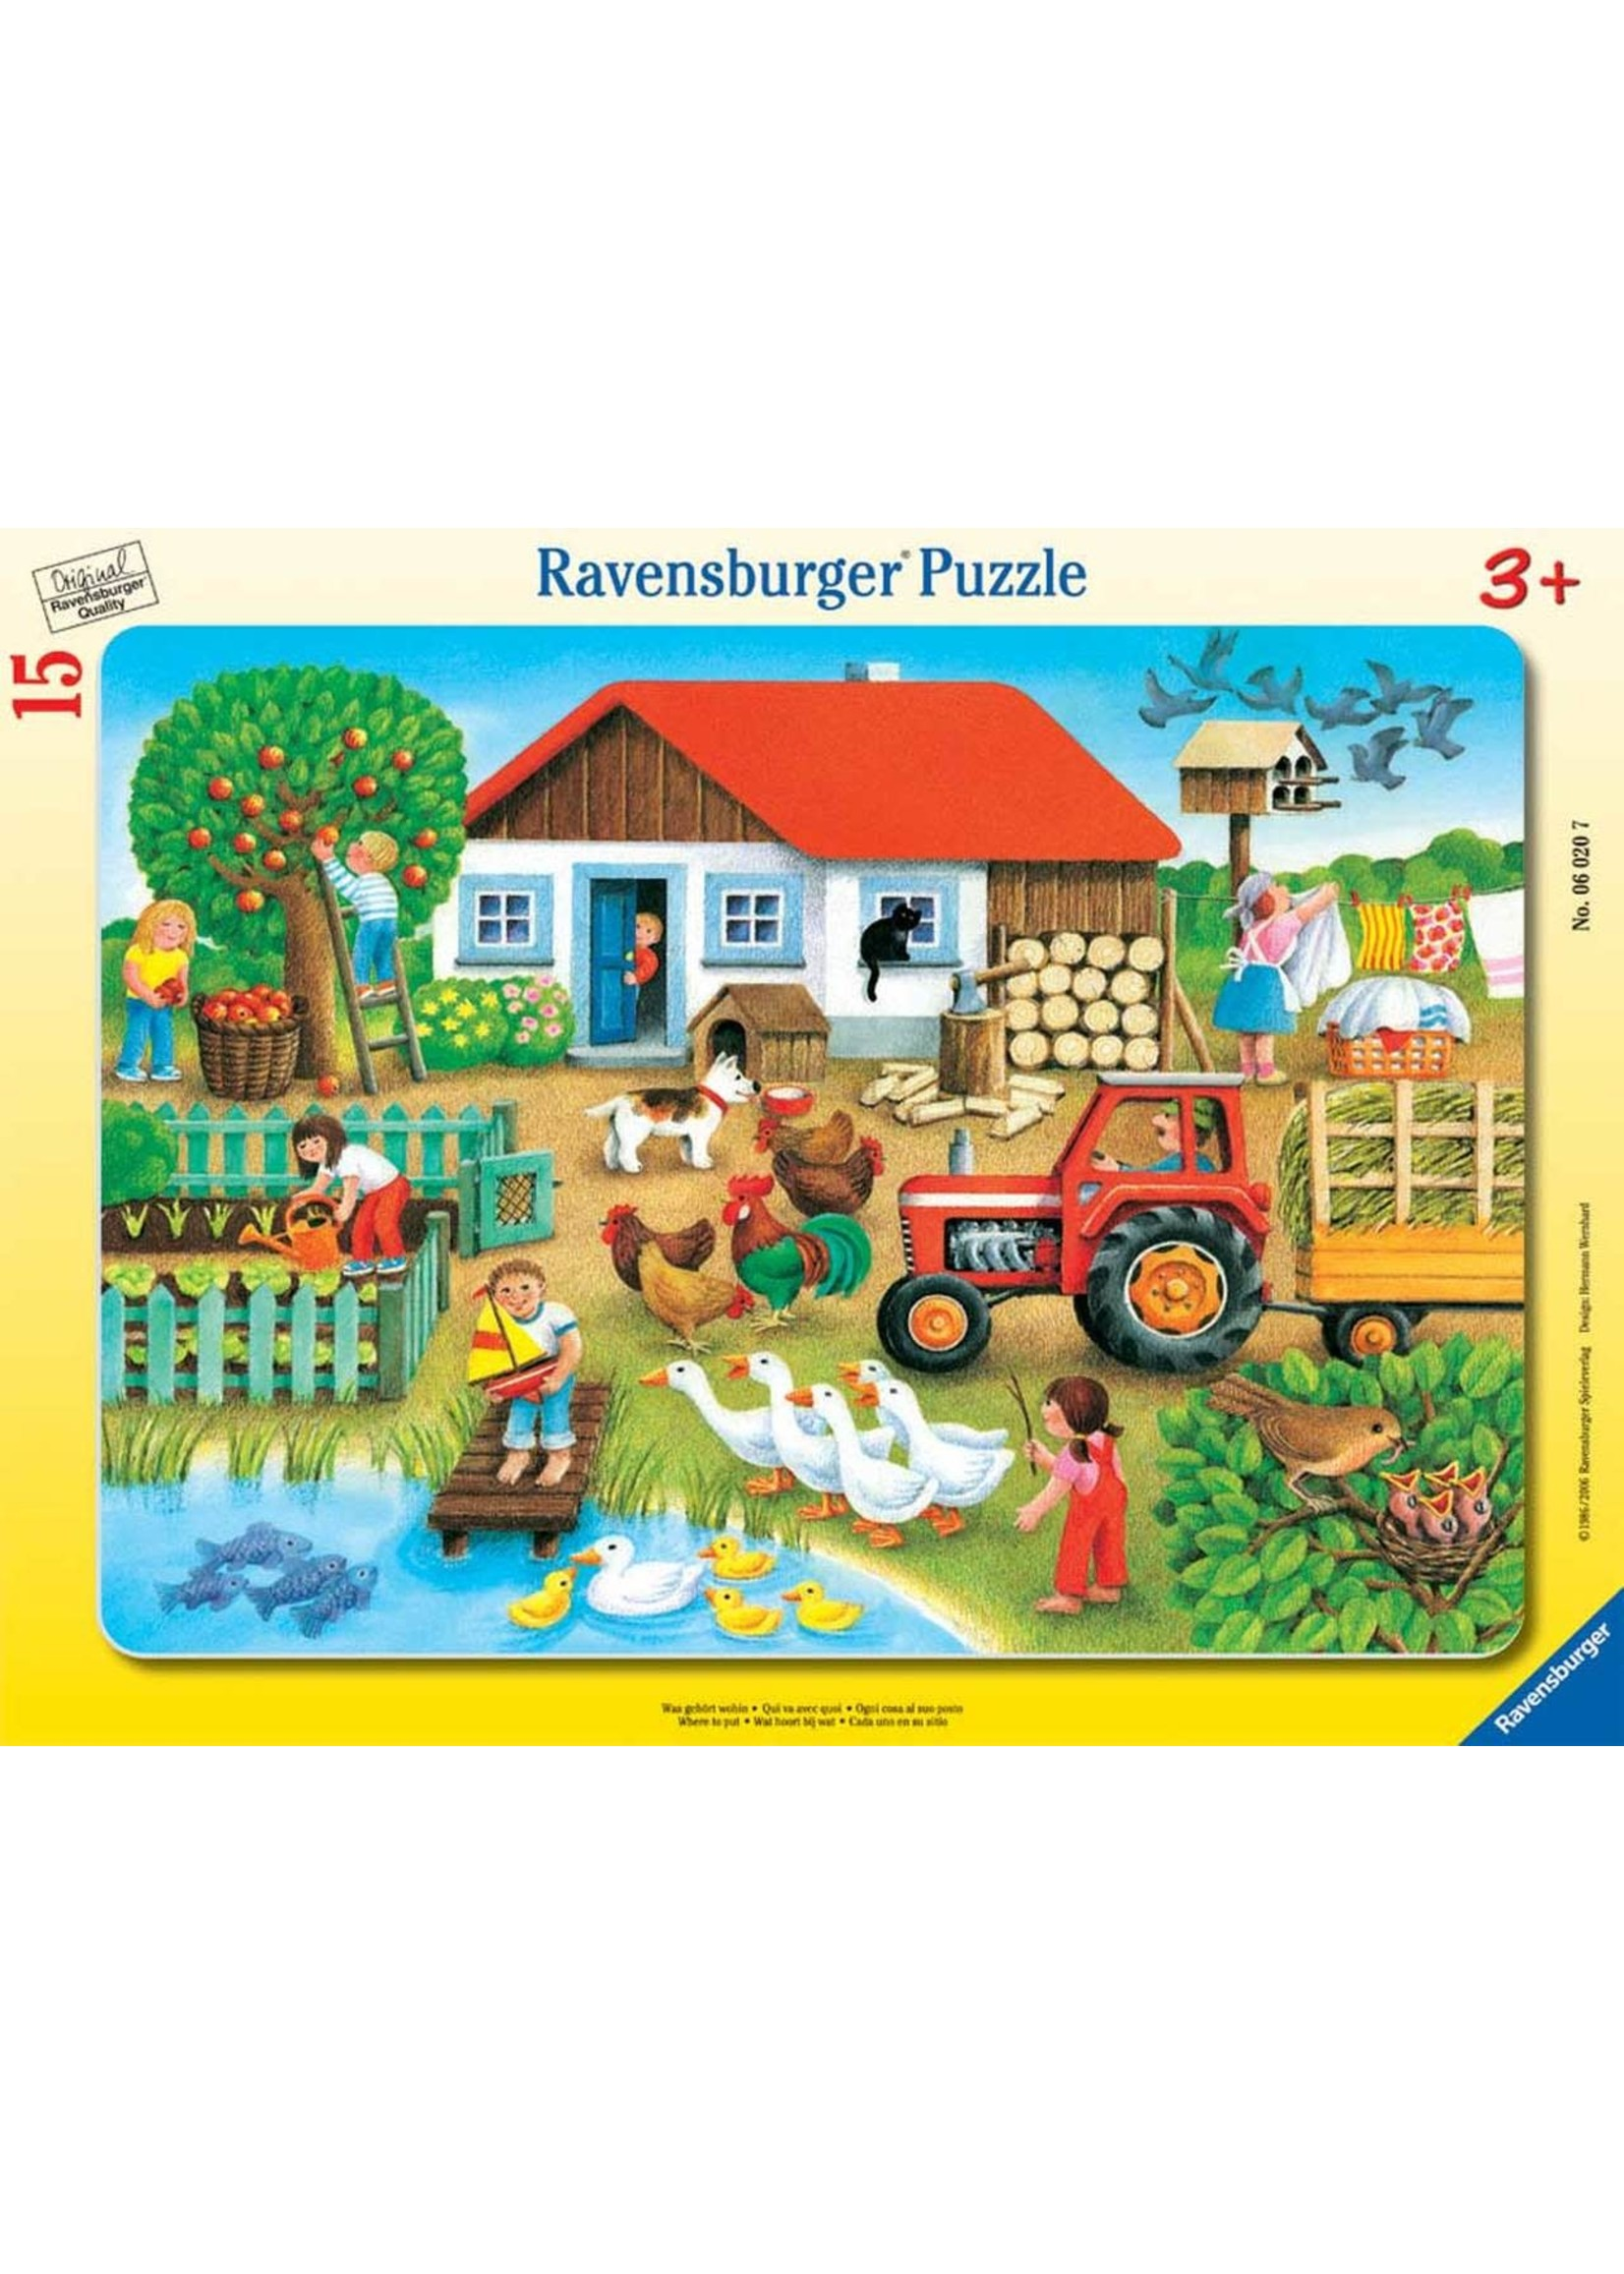 Ravensburger 15pc puzzle Where to Put It?